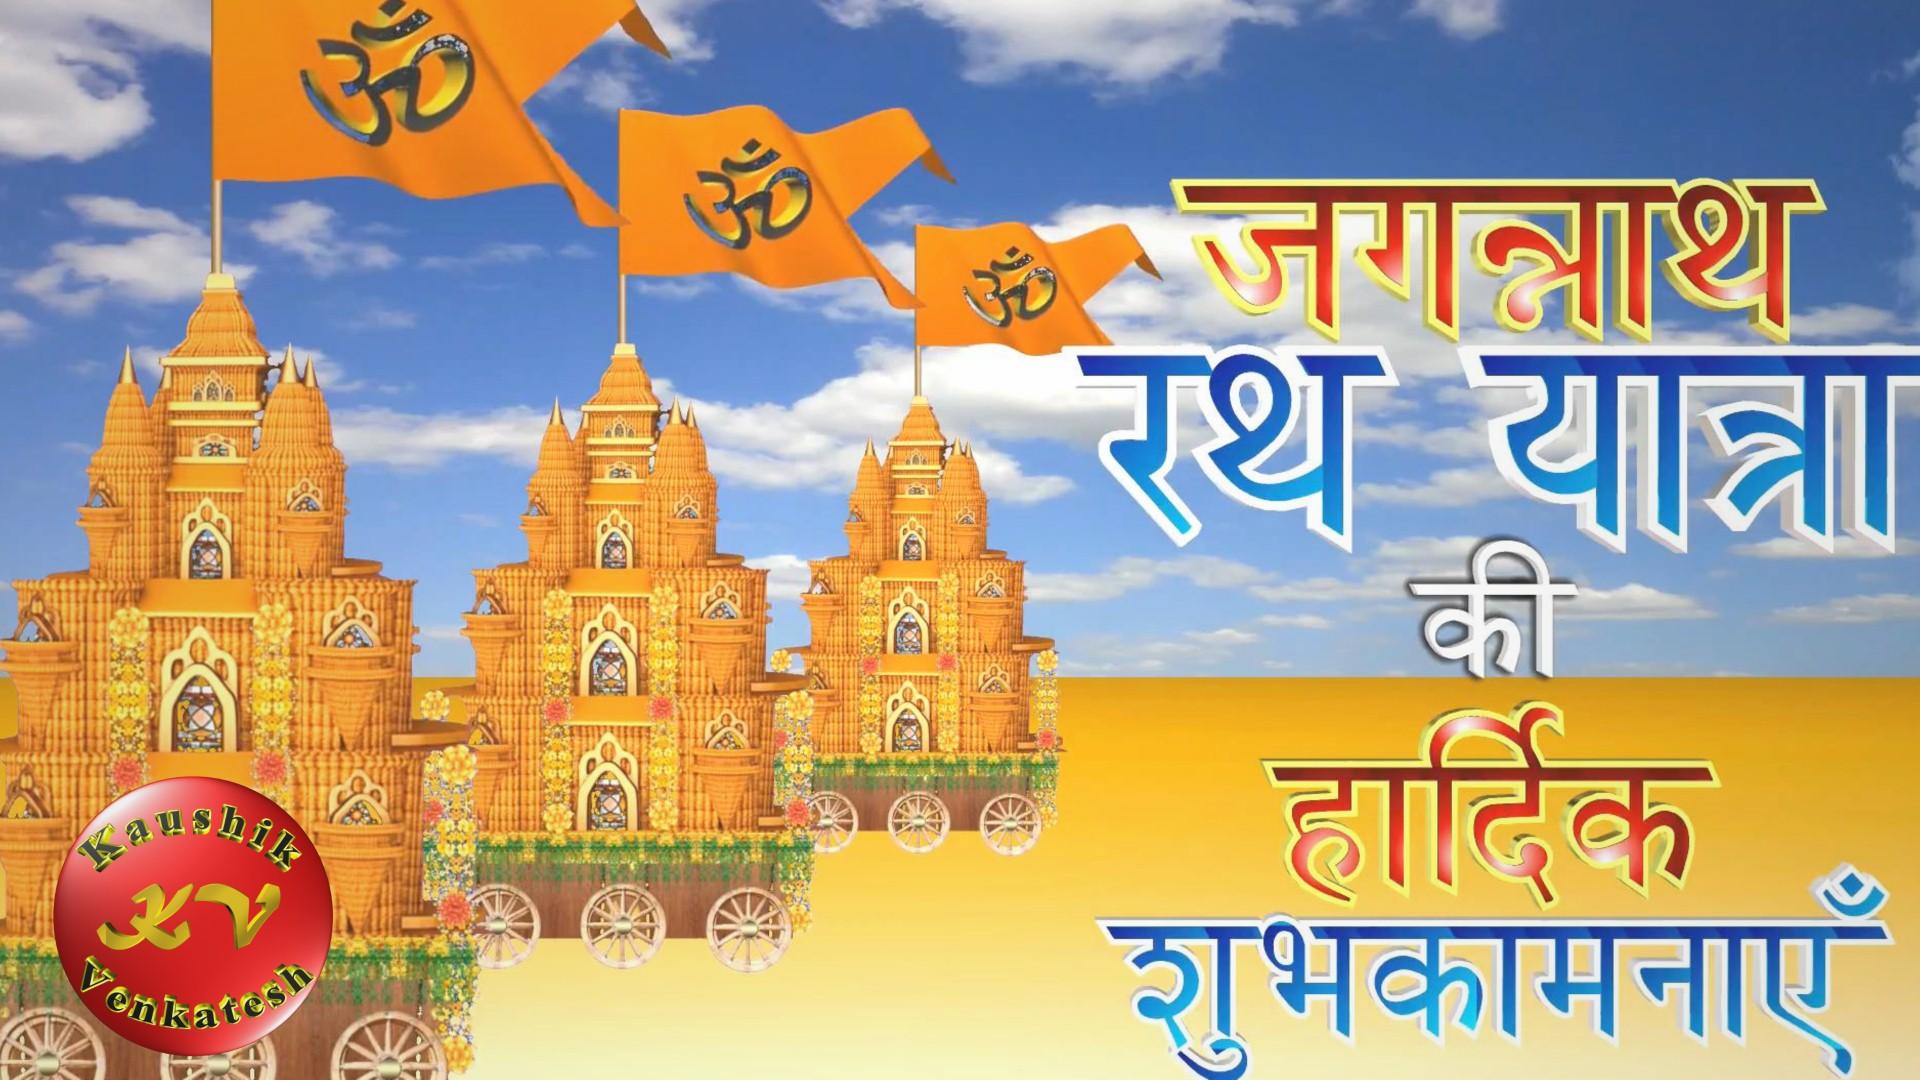 Image of Happy Rath Yatra Wishes in Hindi